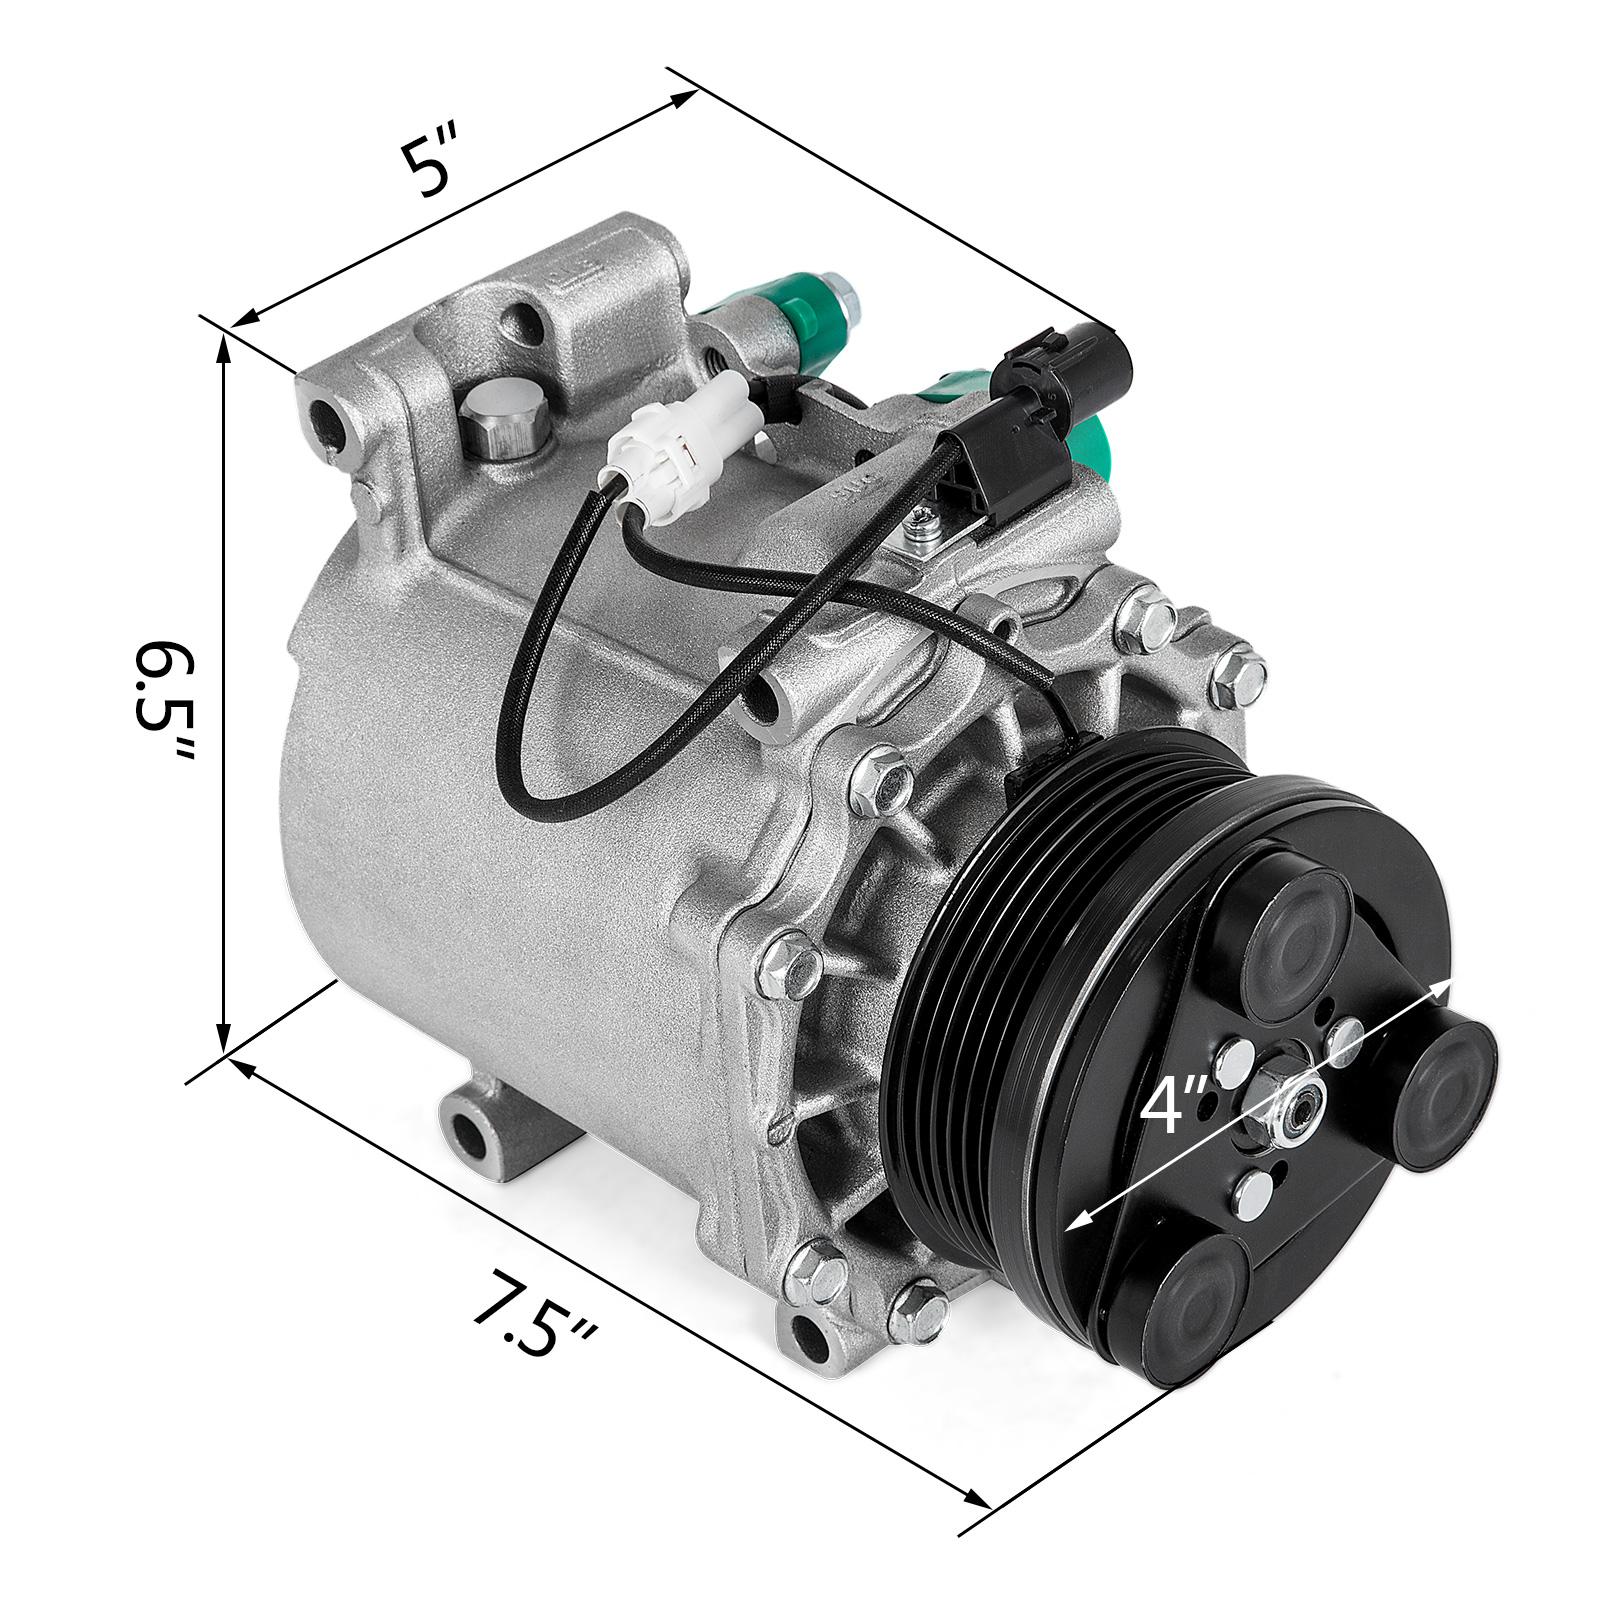 Get AC Compressor for 2004-2012 Mitsubishi Galant 2006-2011 Eclipse 2.4L Motor